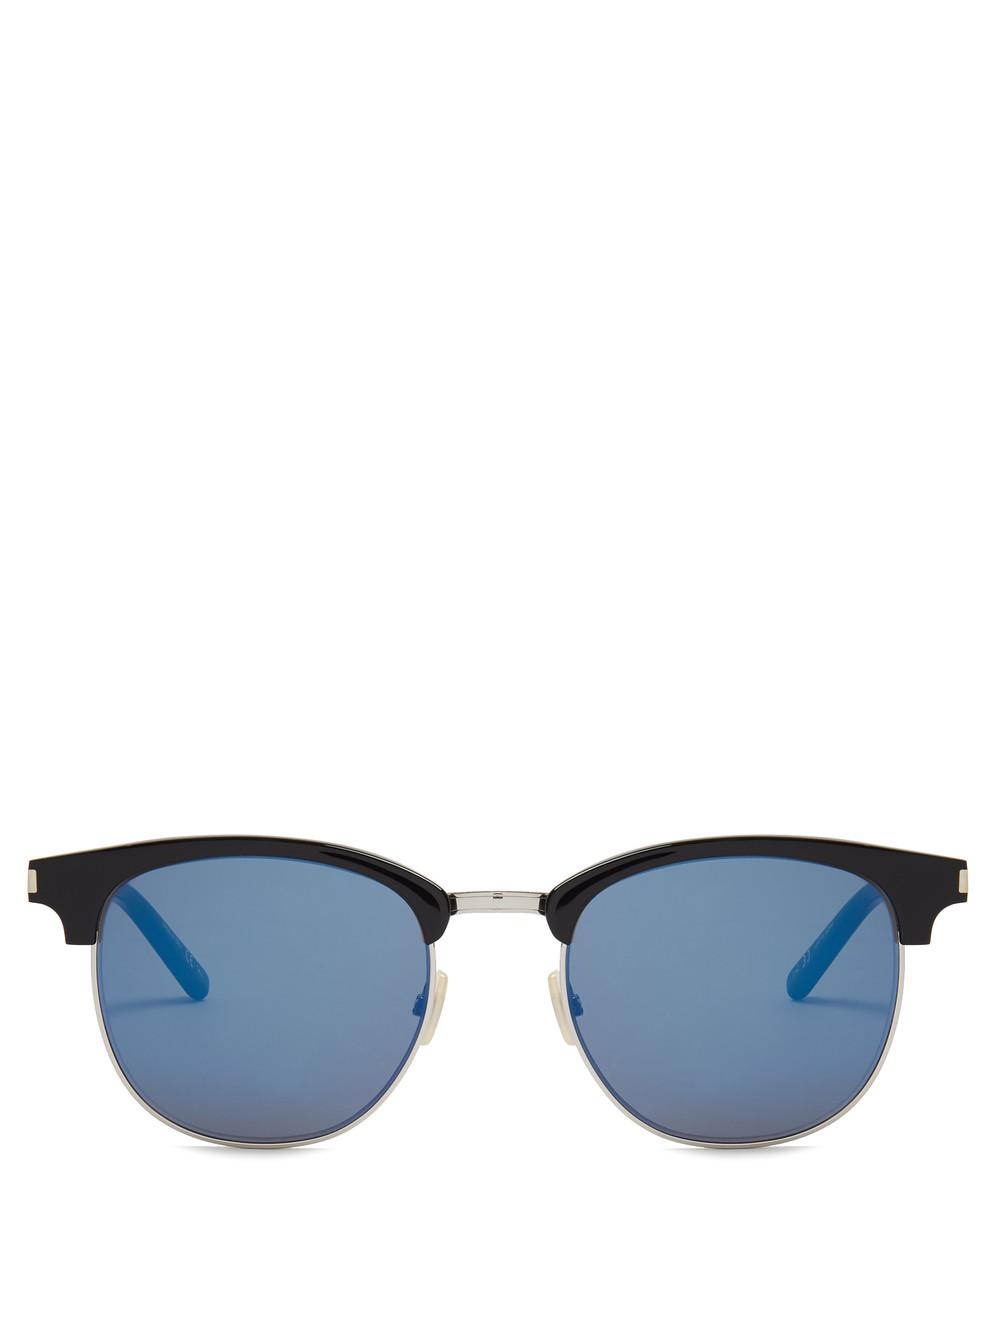 DUCO Mens Sports Polarized Sunglasses UV Protection